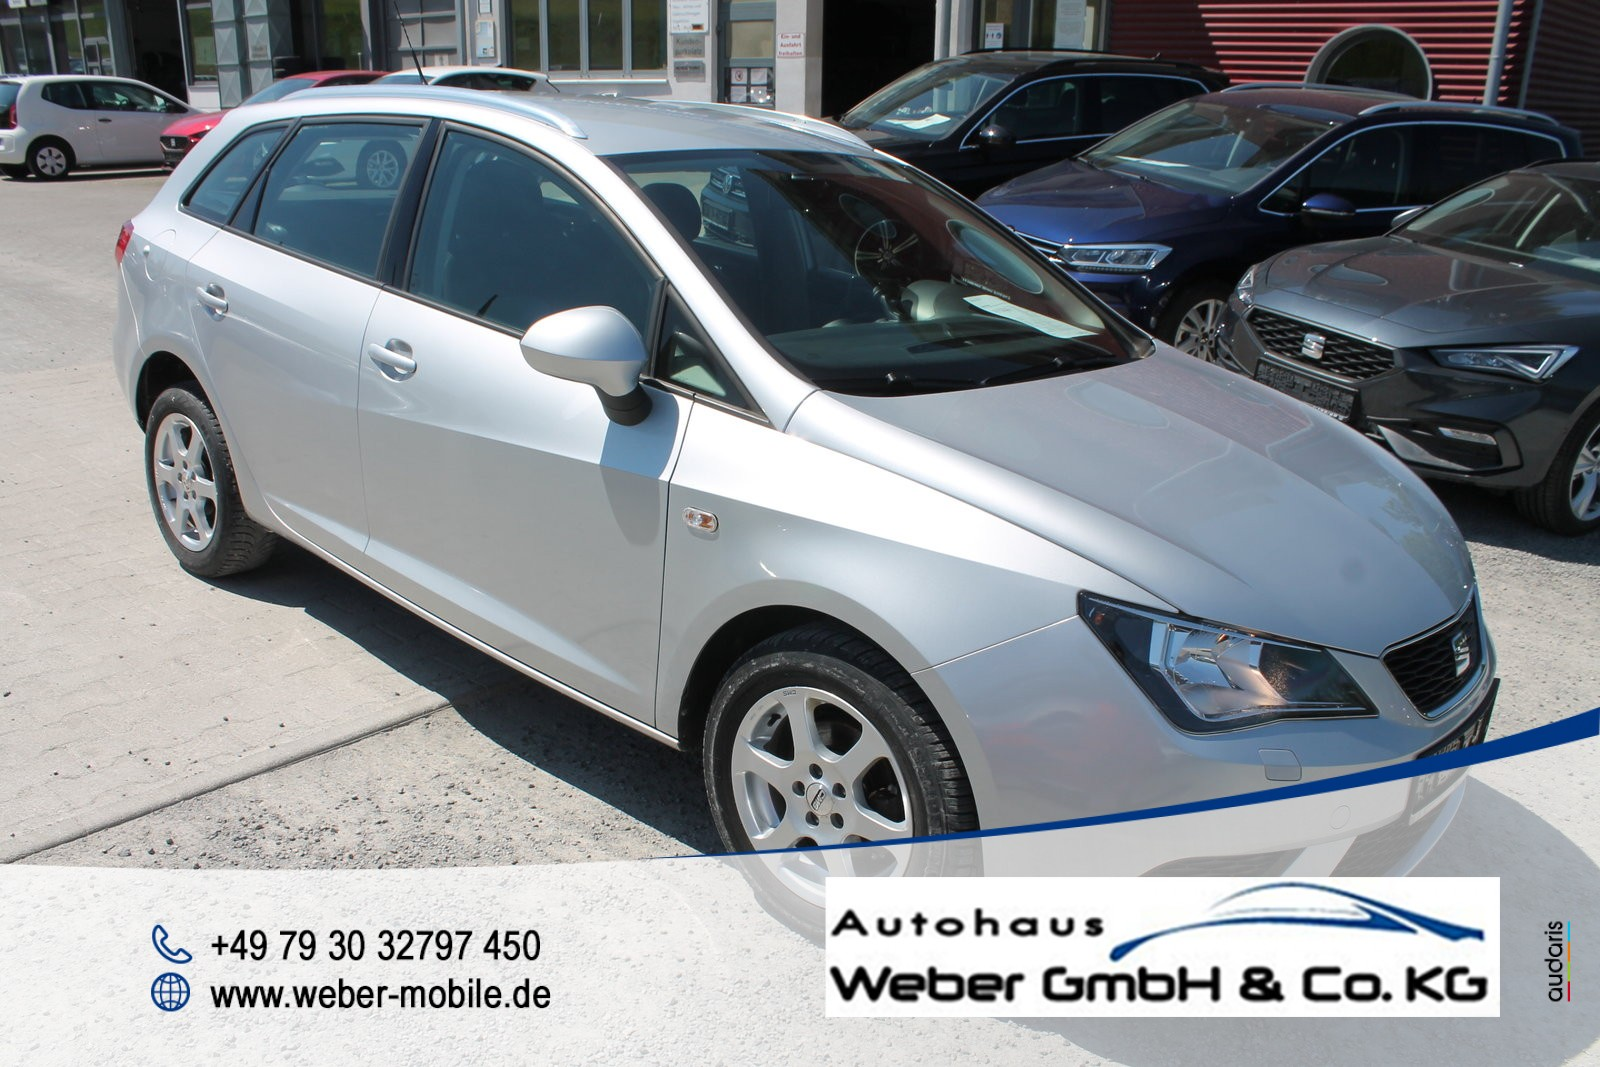 Seat Ibiza ST 1.2 *Style*Climatronic*SHZ*ISO FIX*Radio*, Jahr 2014, Benzin